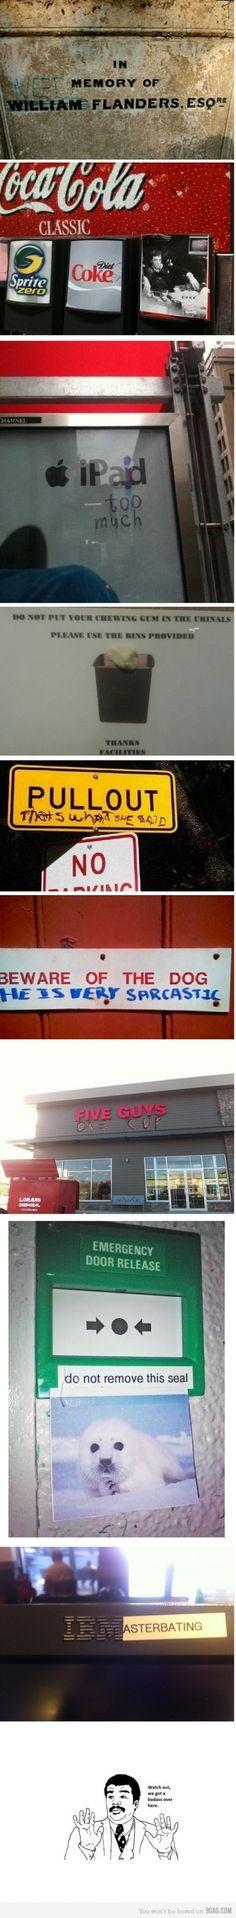 Act of Vandalism I